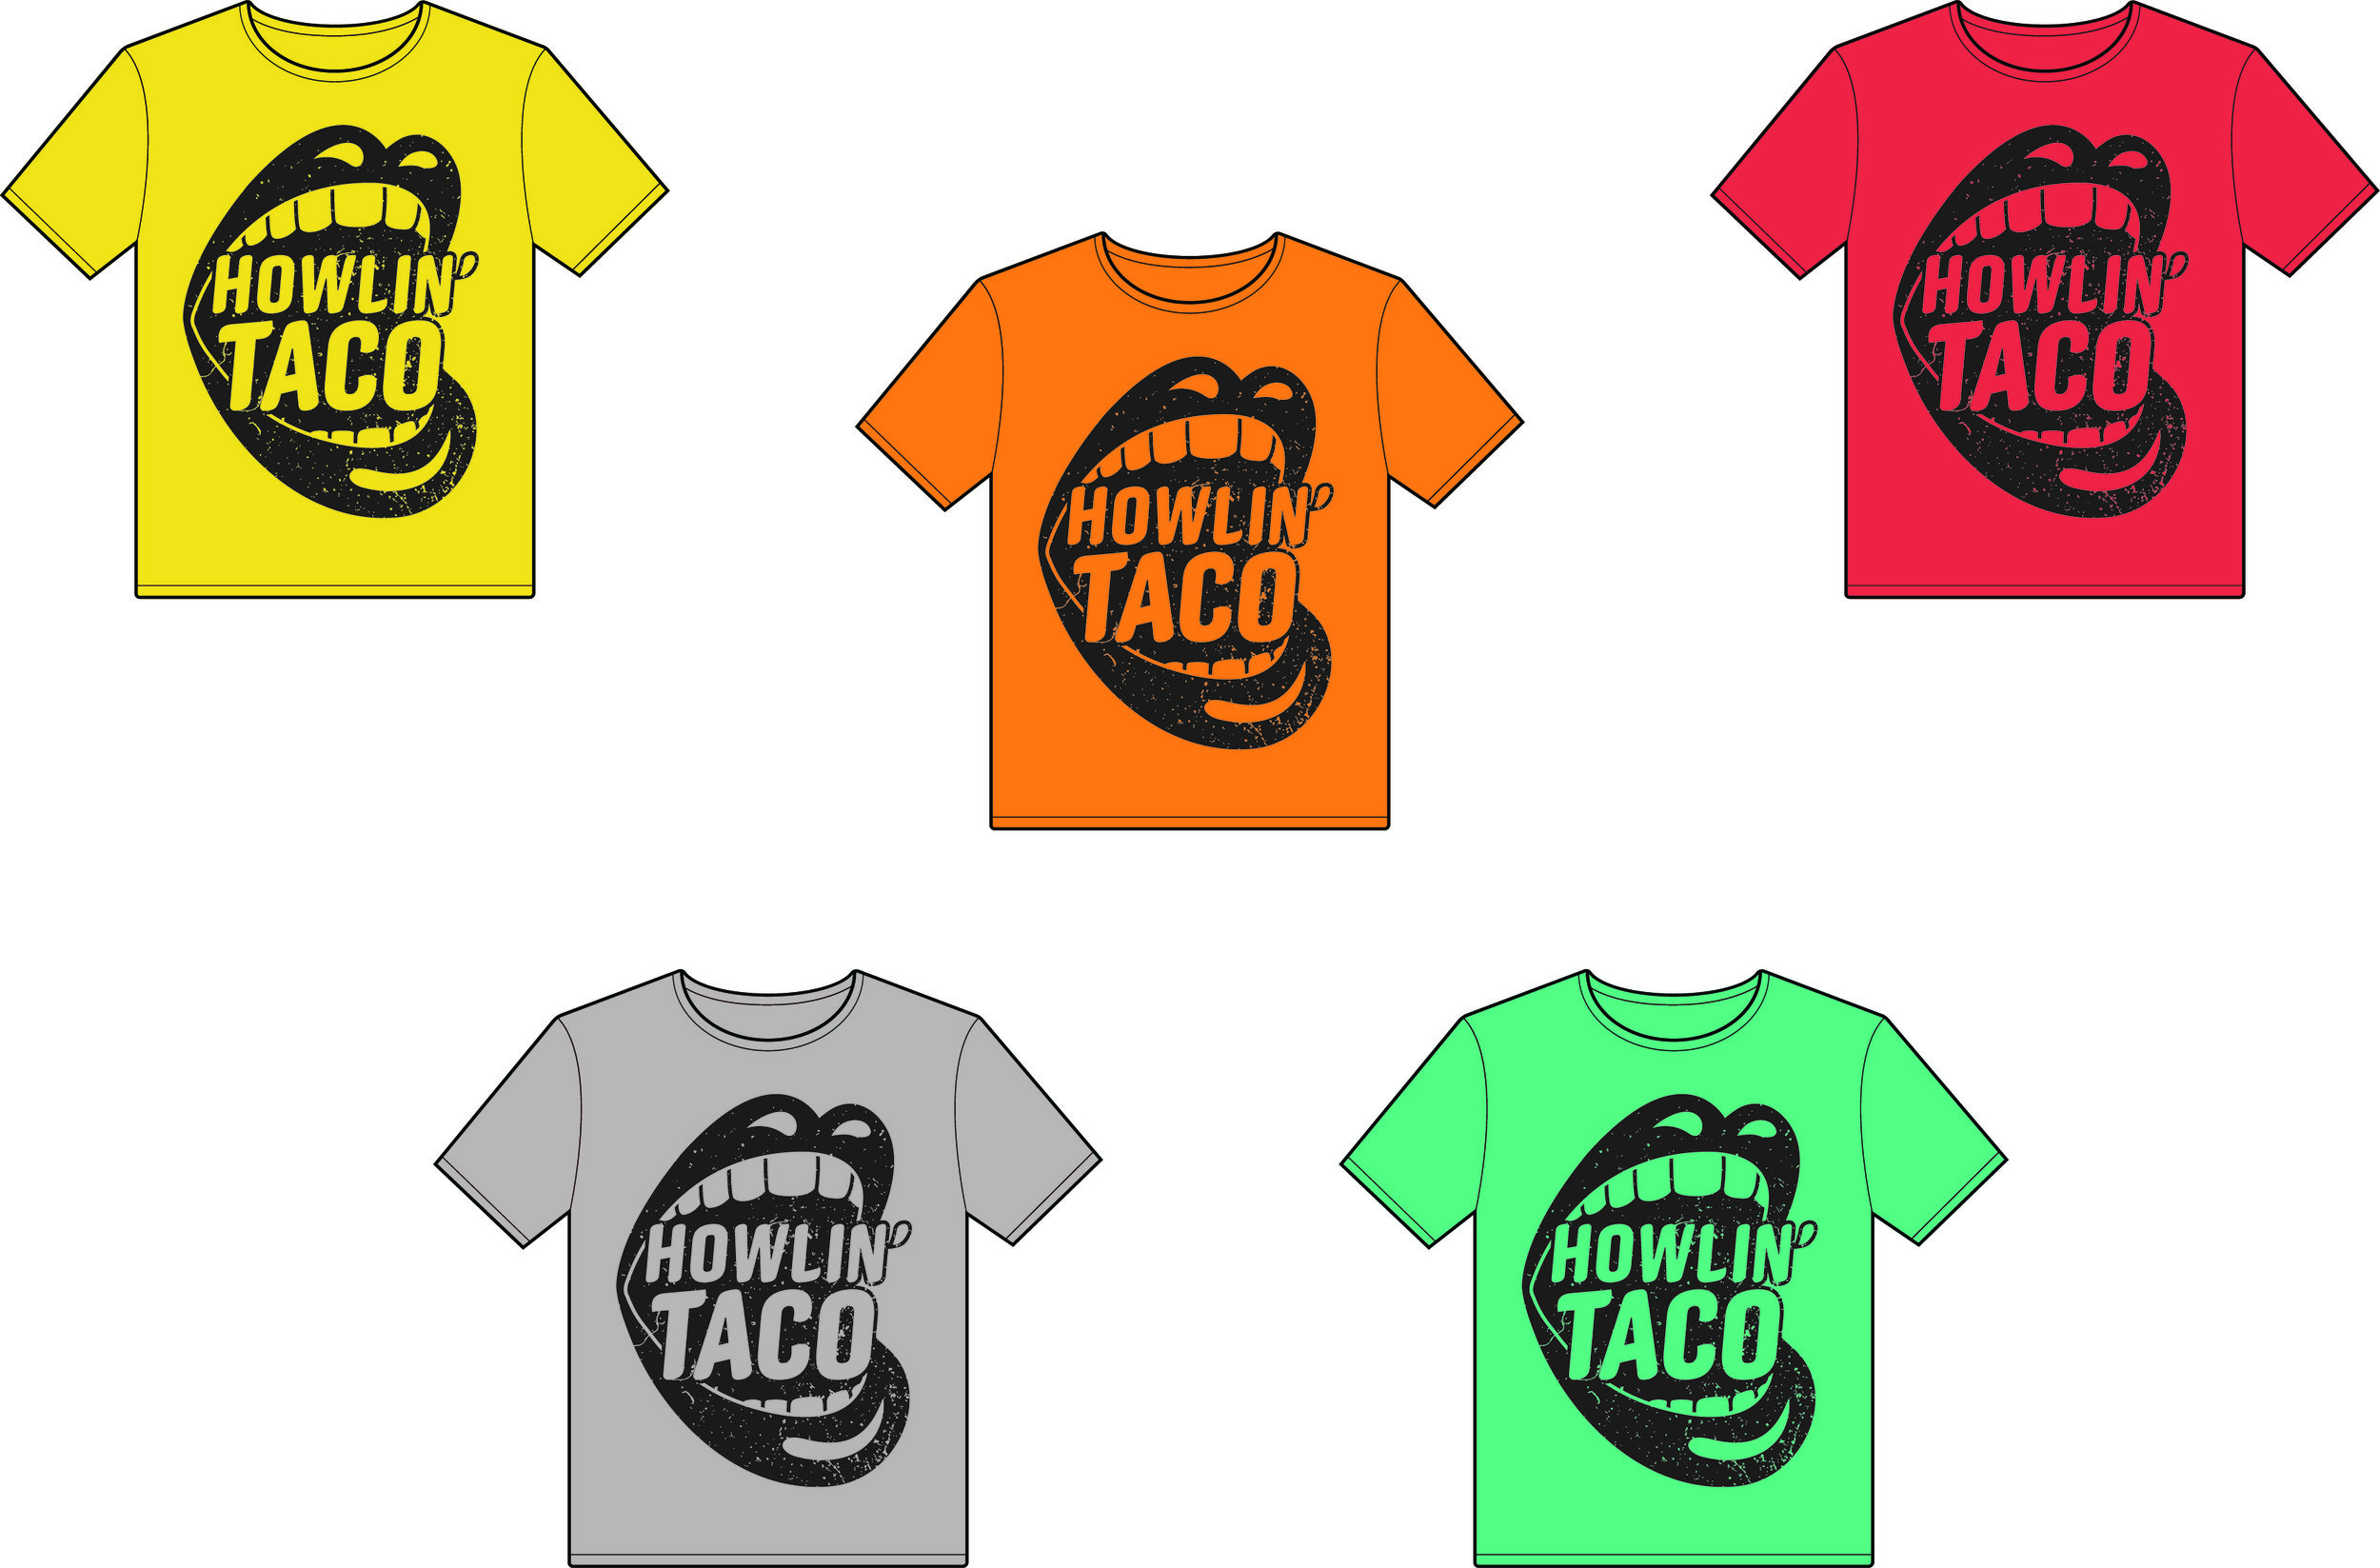 Howlin' t-shirts